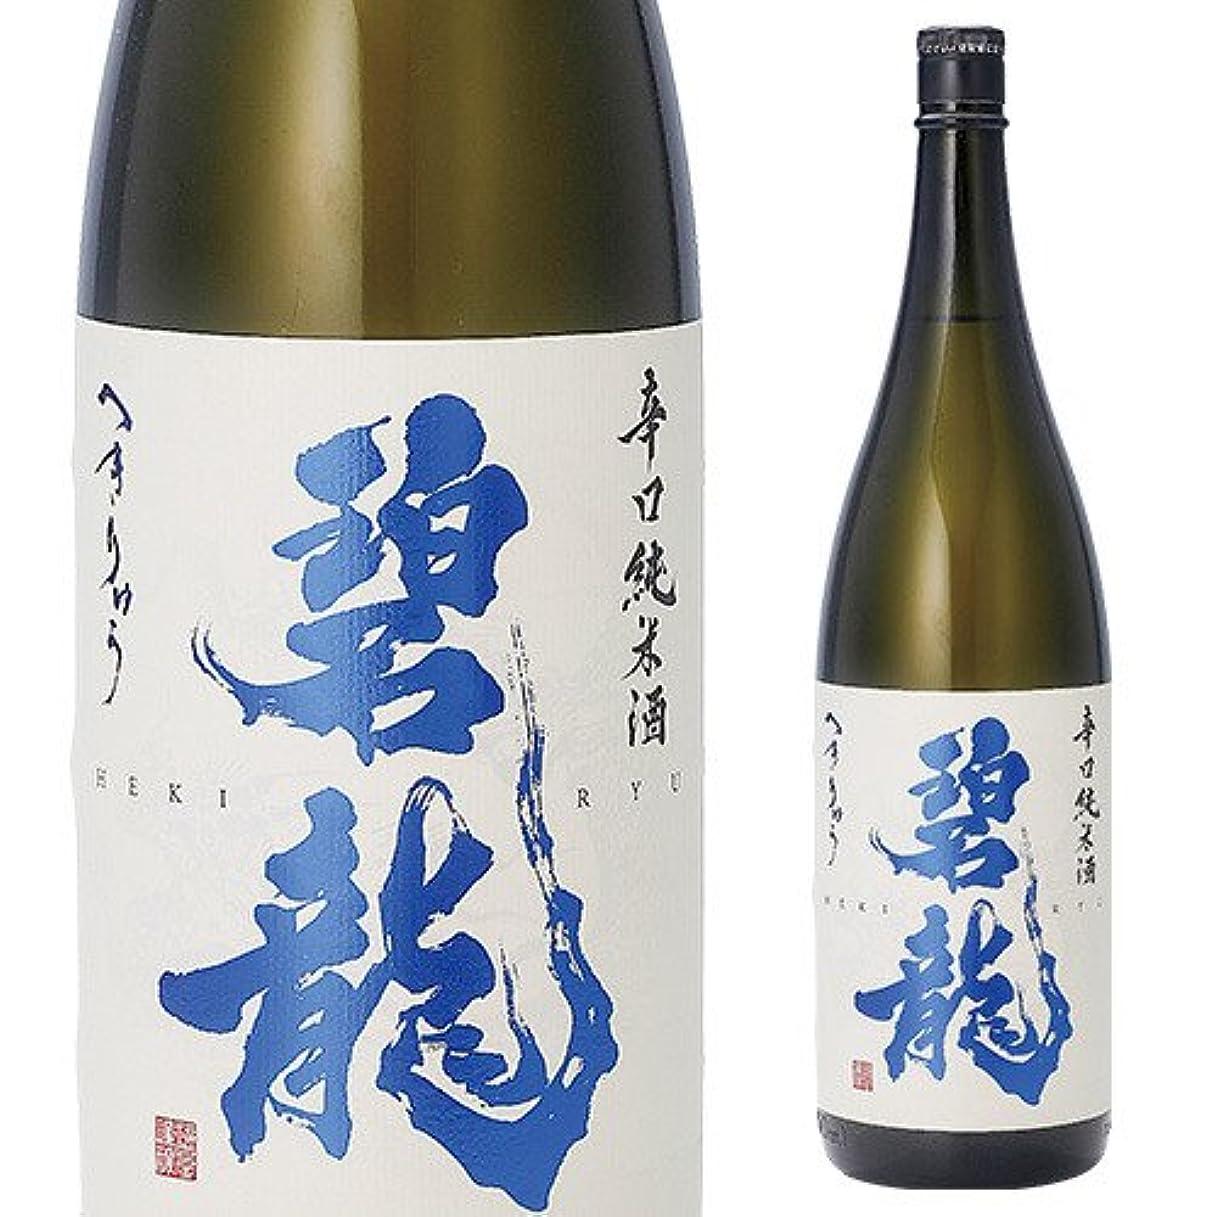 再生タック療法碧龍 辛口純米酒 1.8L